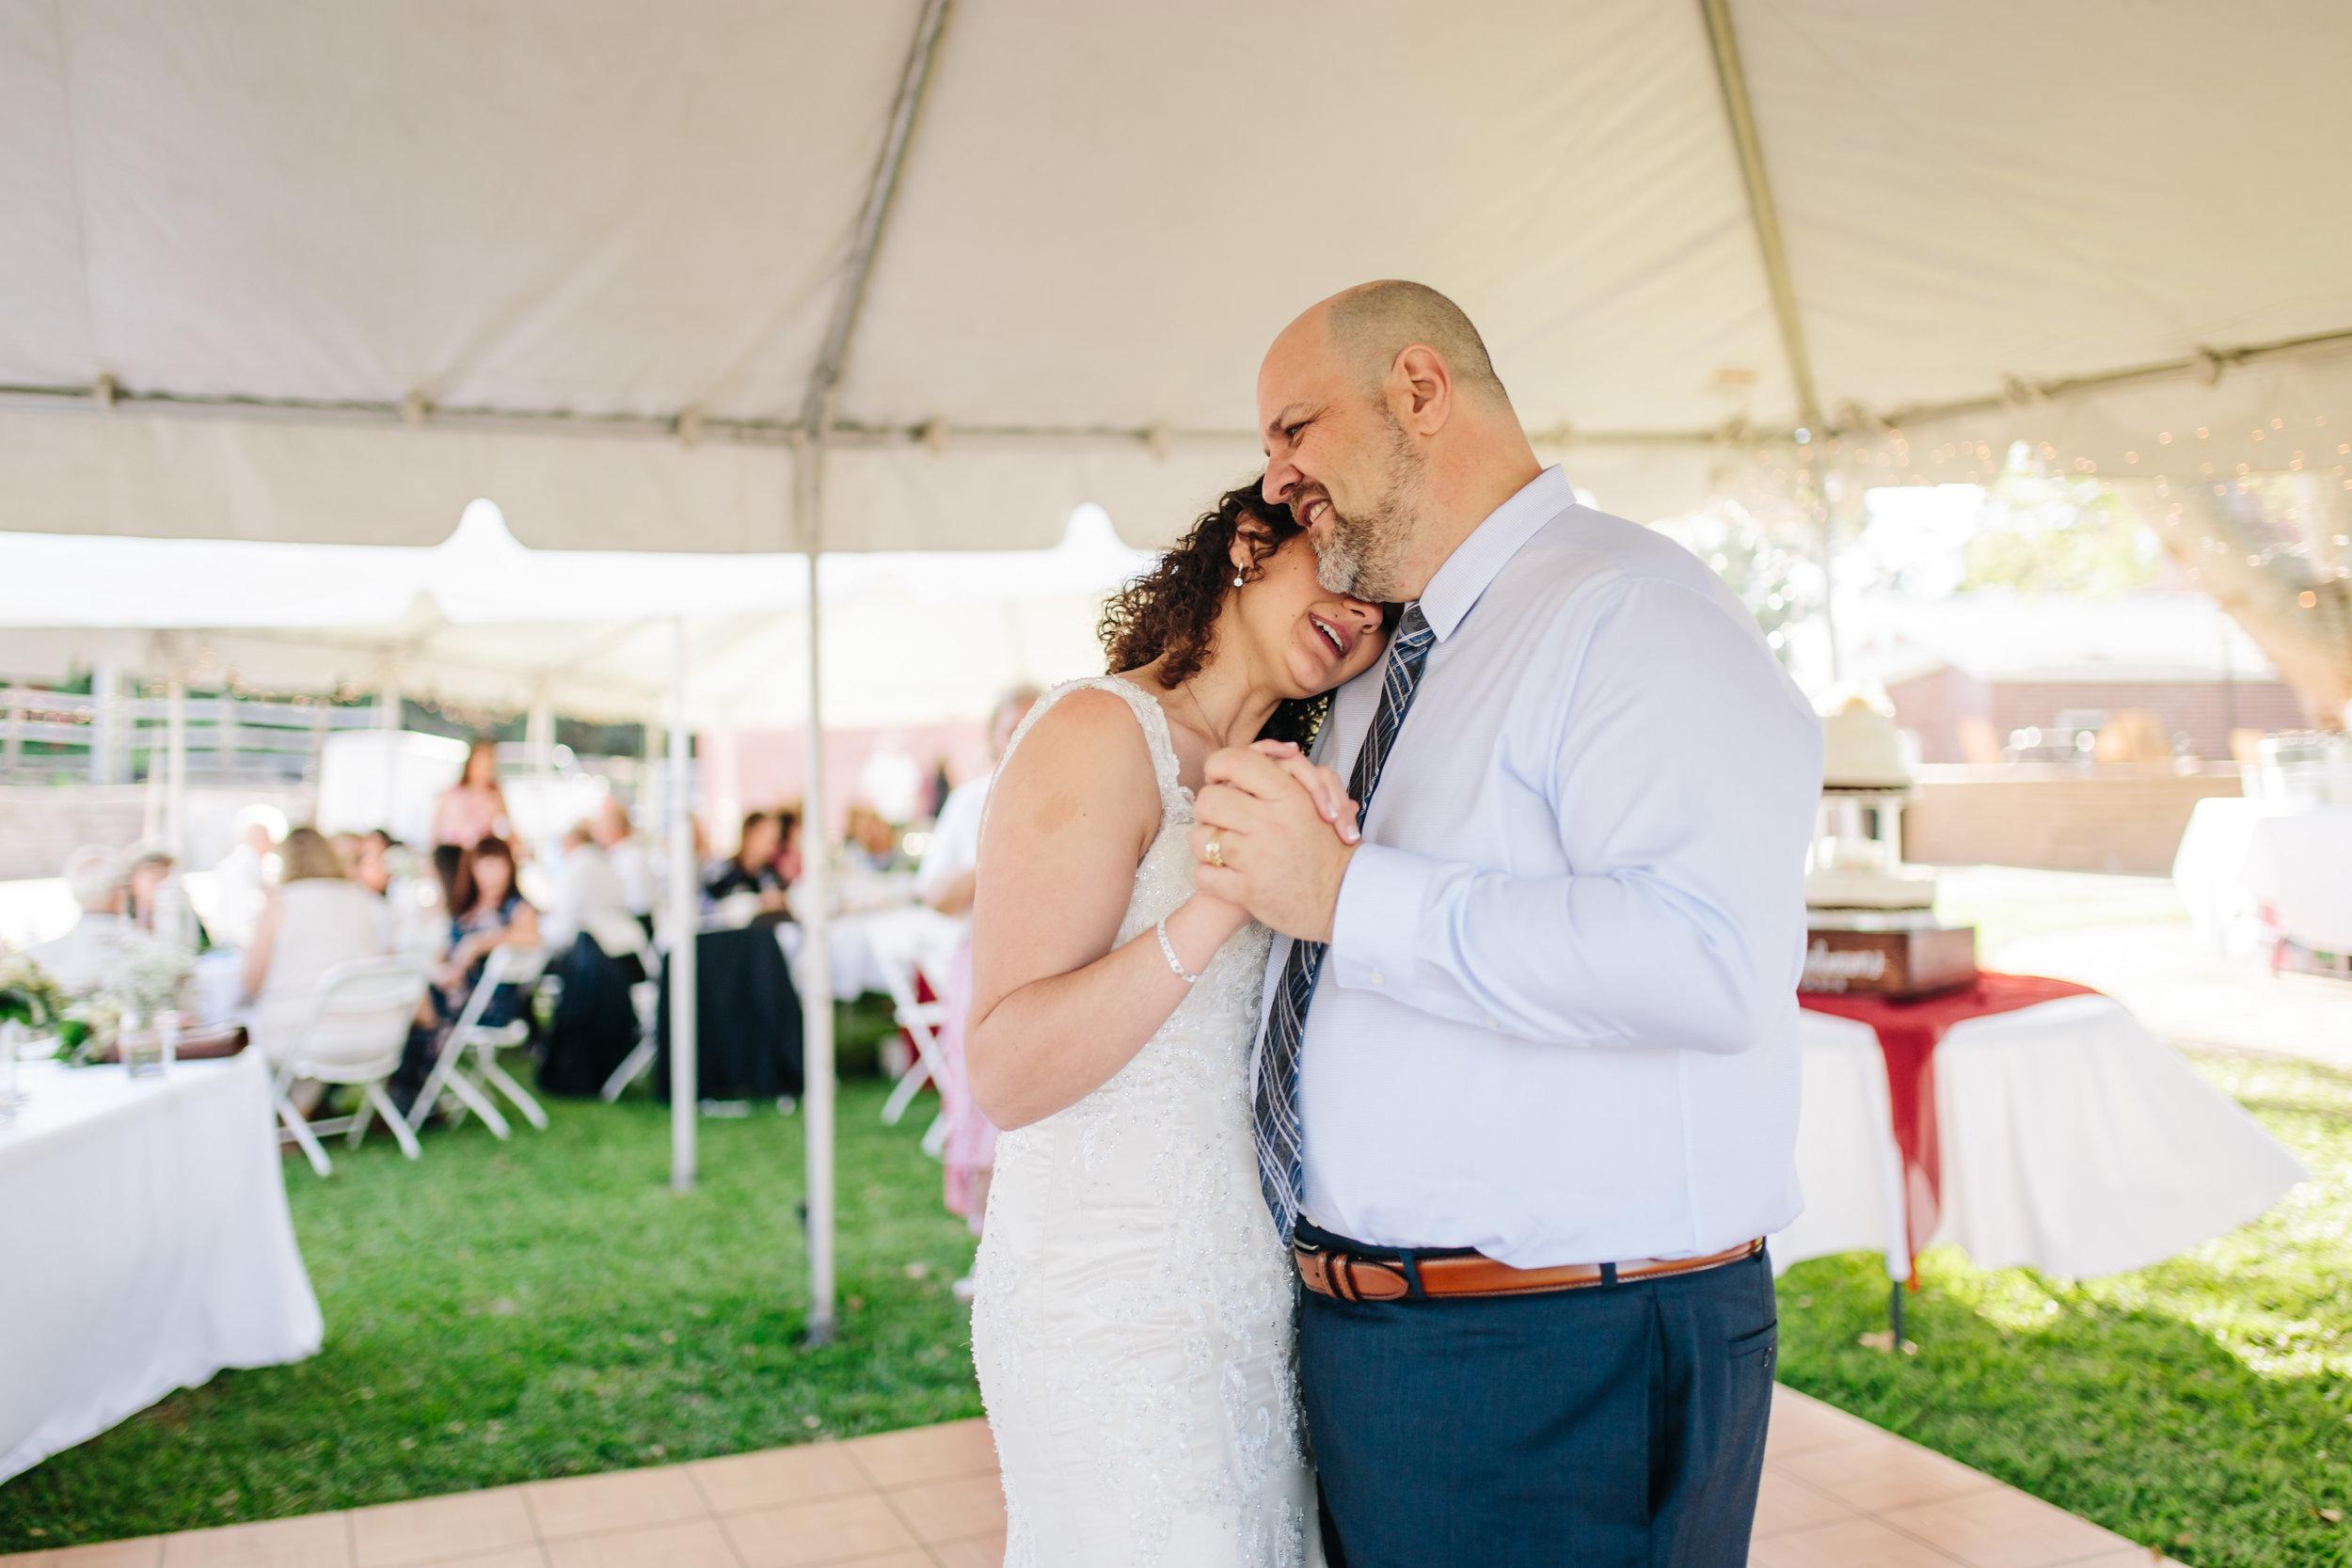 2018.03.17 Allison and Chuck Wedding Waelti Melbourne (636 of 569).jpg